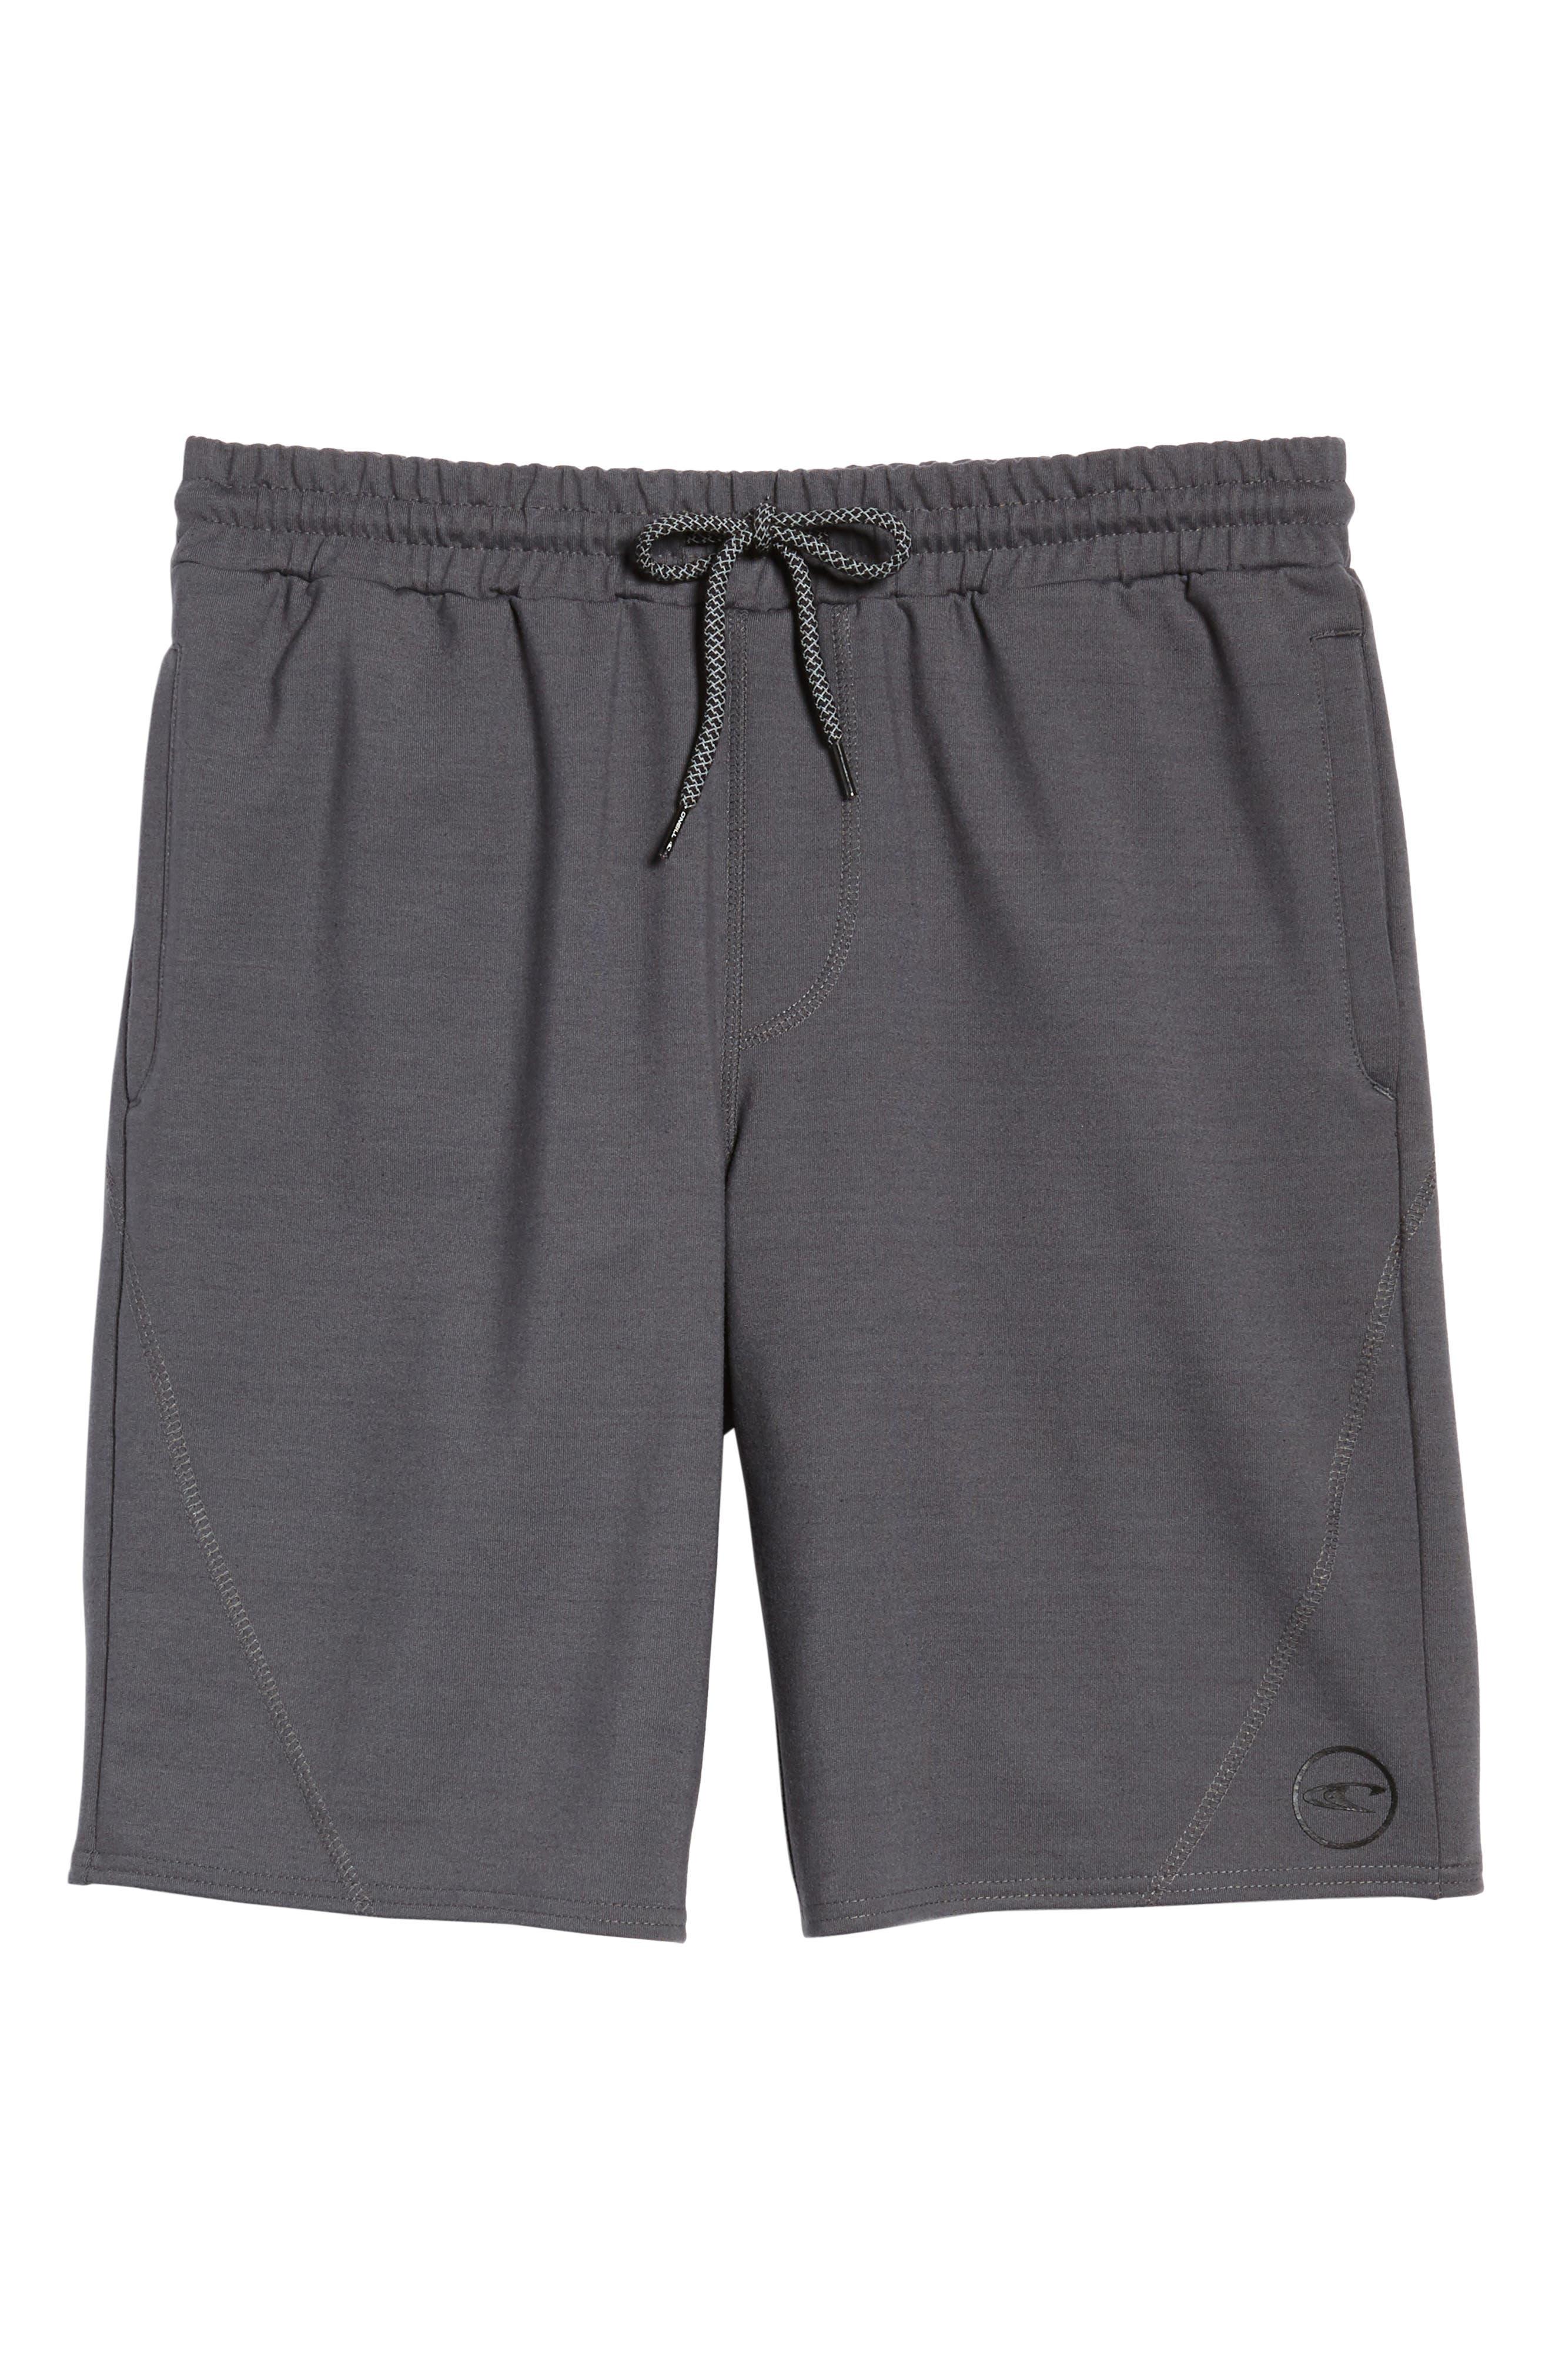 Traveler Fleece Shorts,                             Alternate thumbnail 6, color,                             020